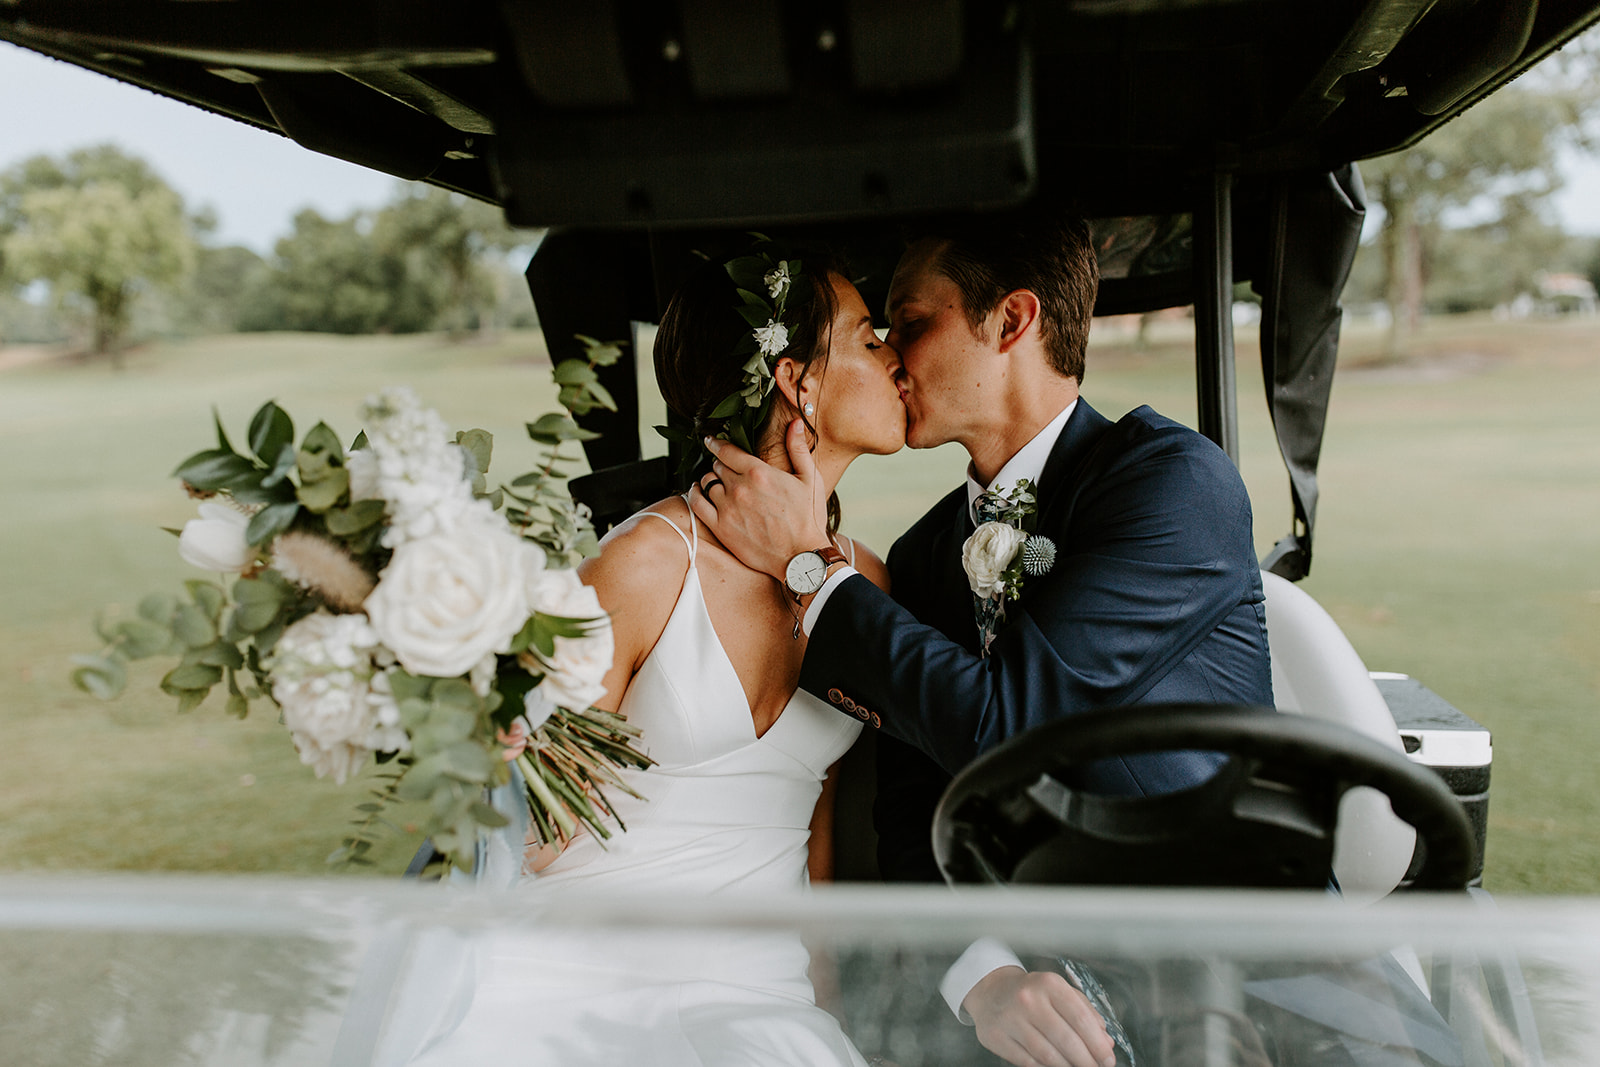 orlando wedding venue - dubsdread catering - couple kissing golf cart